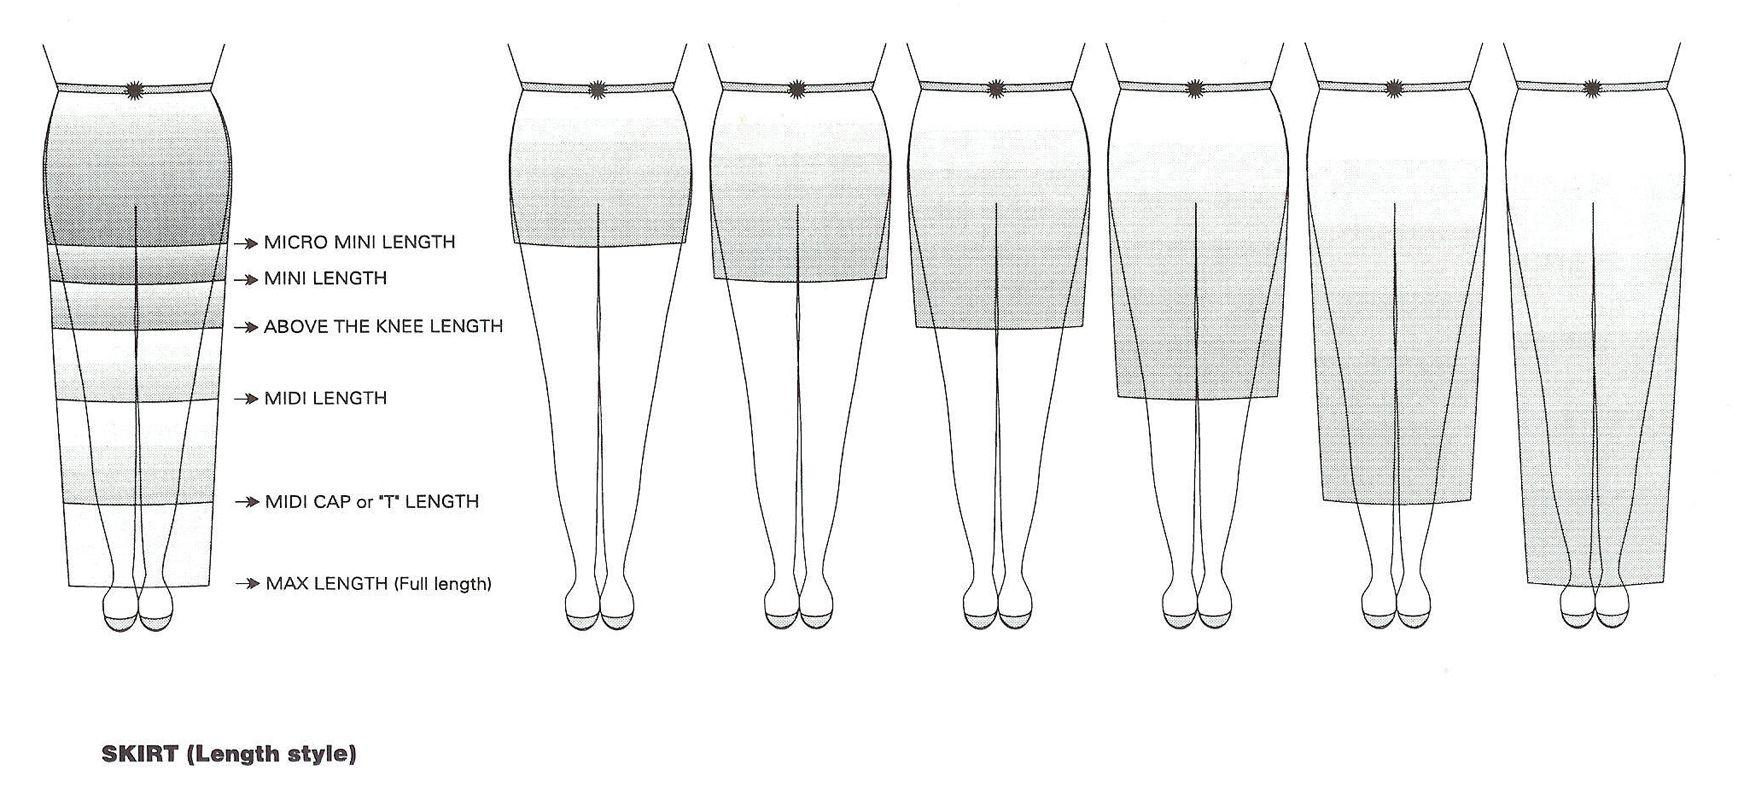 Guide To Skirt Lengths